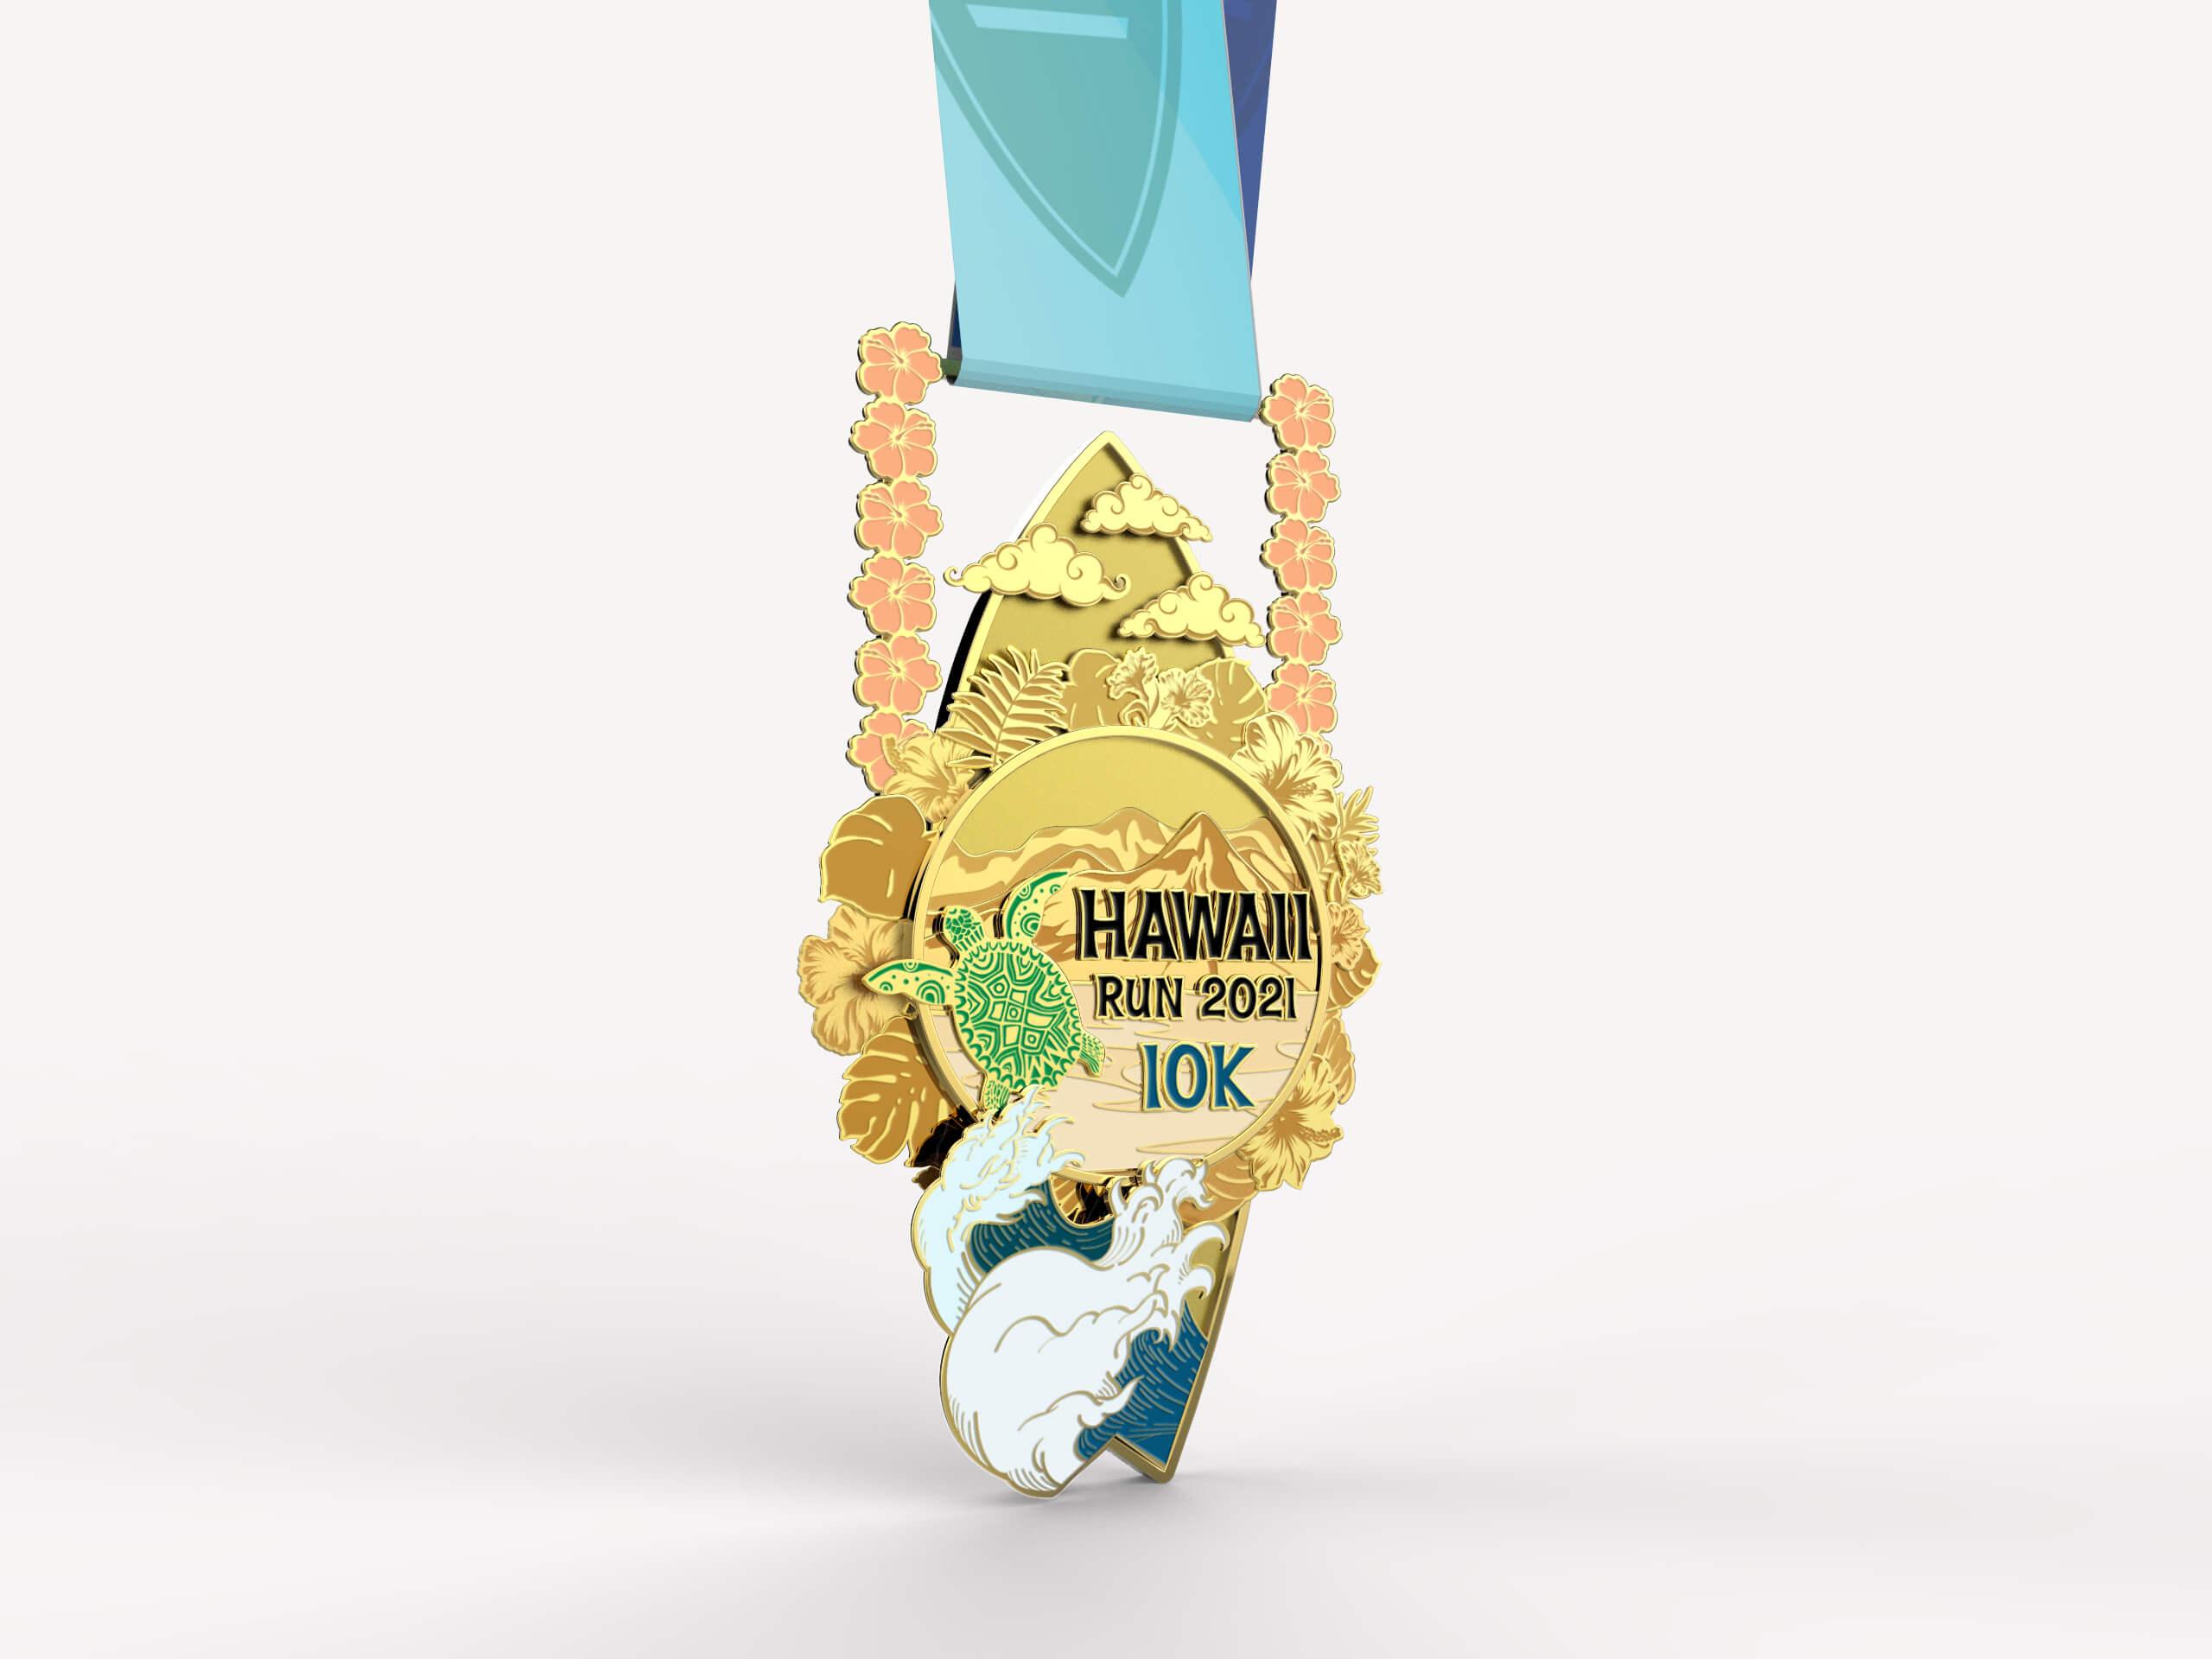 Medalha de 10K da prova VirtualRunners